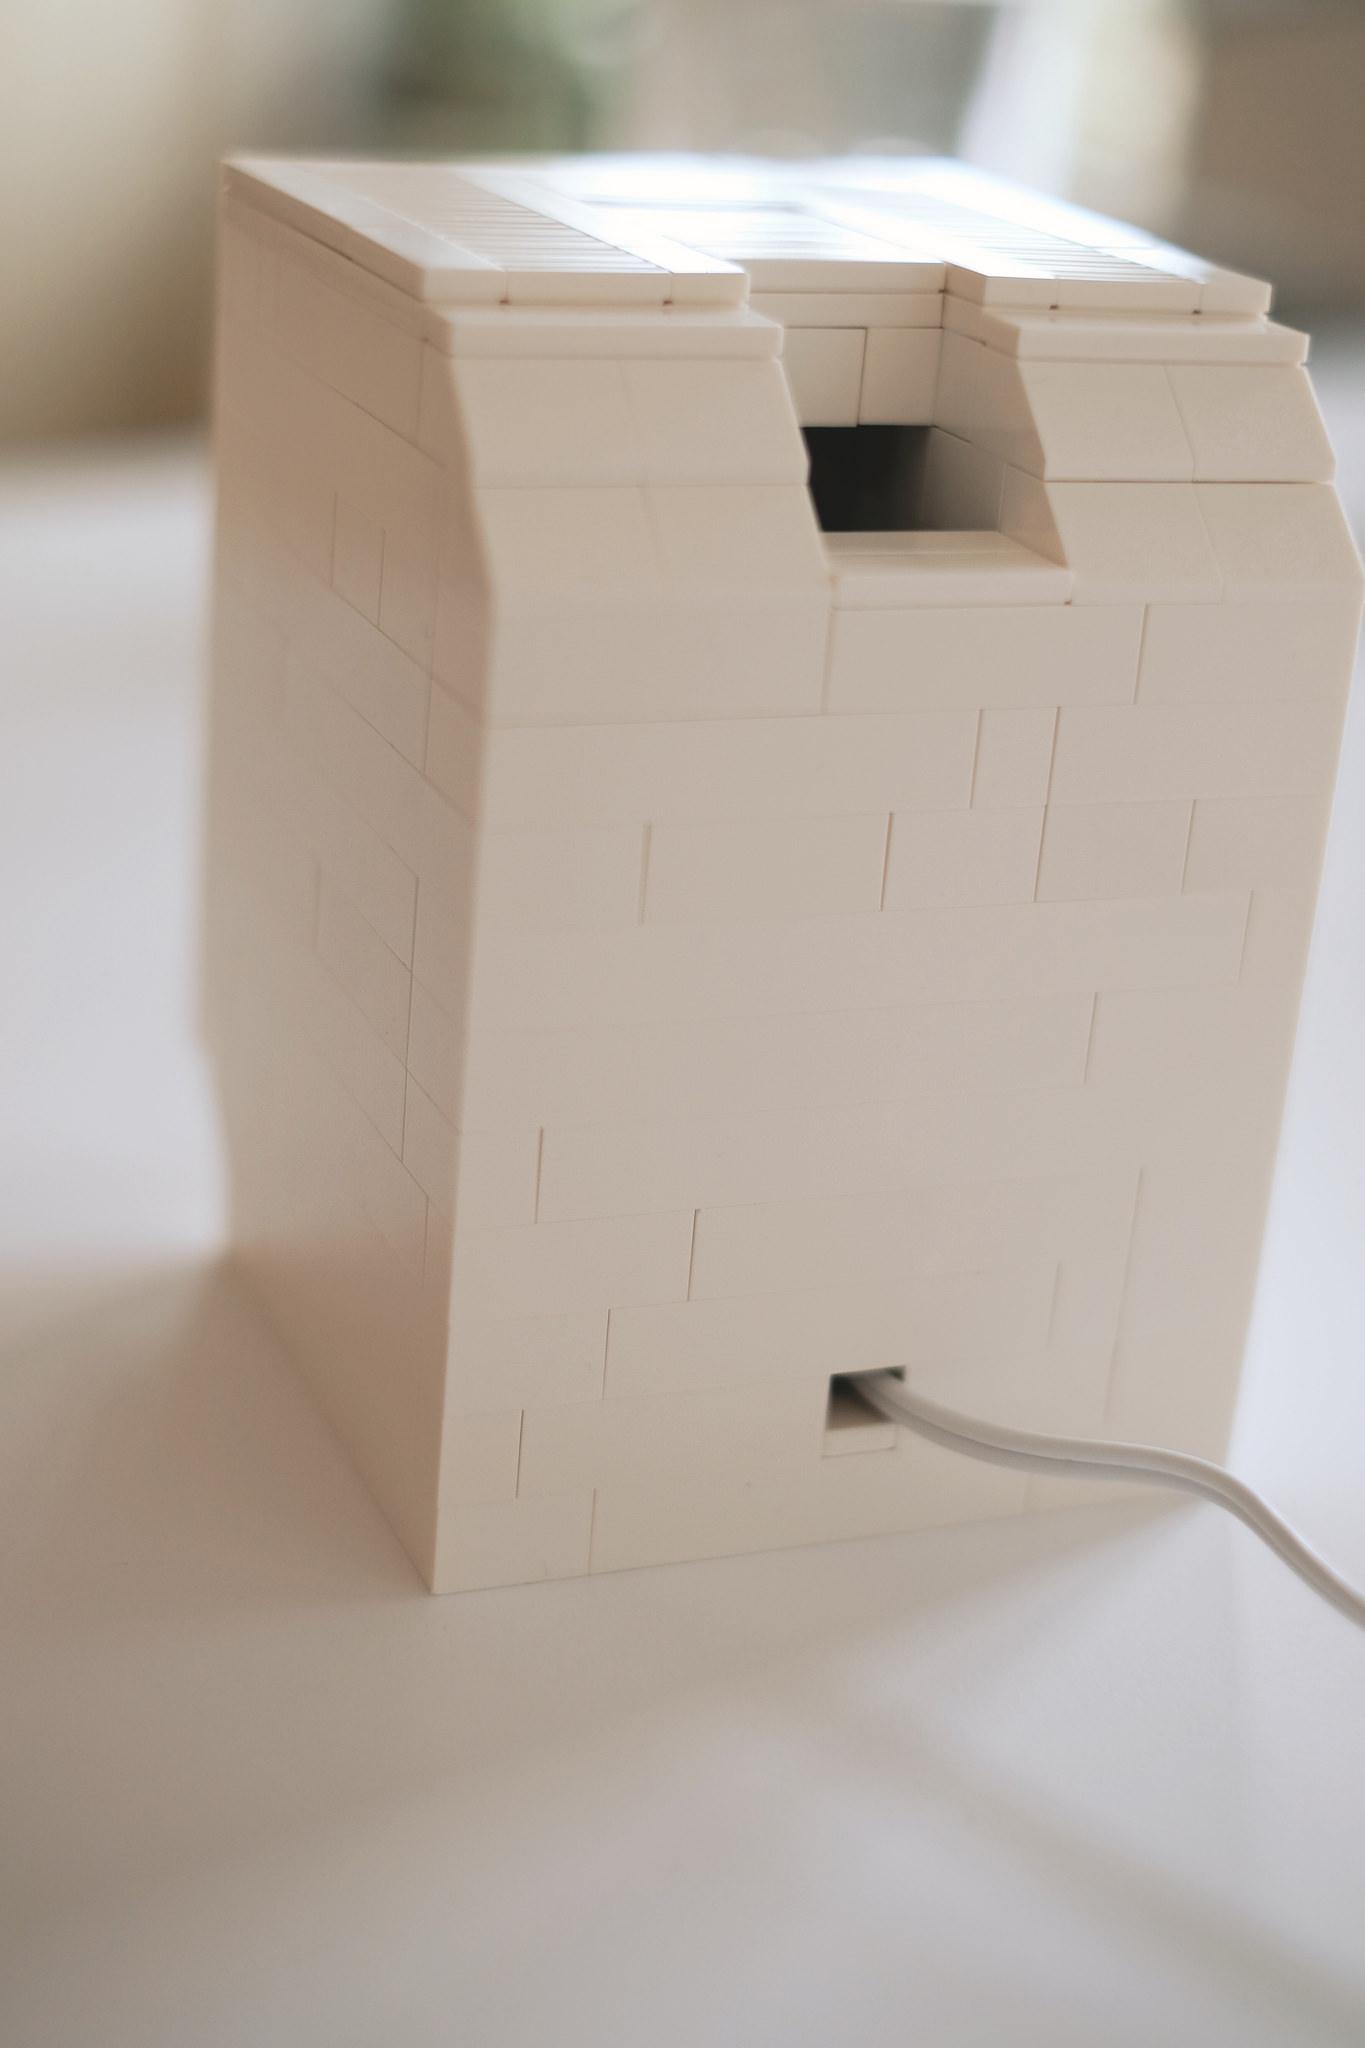 lego-mac-classic-004